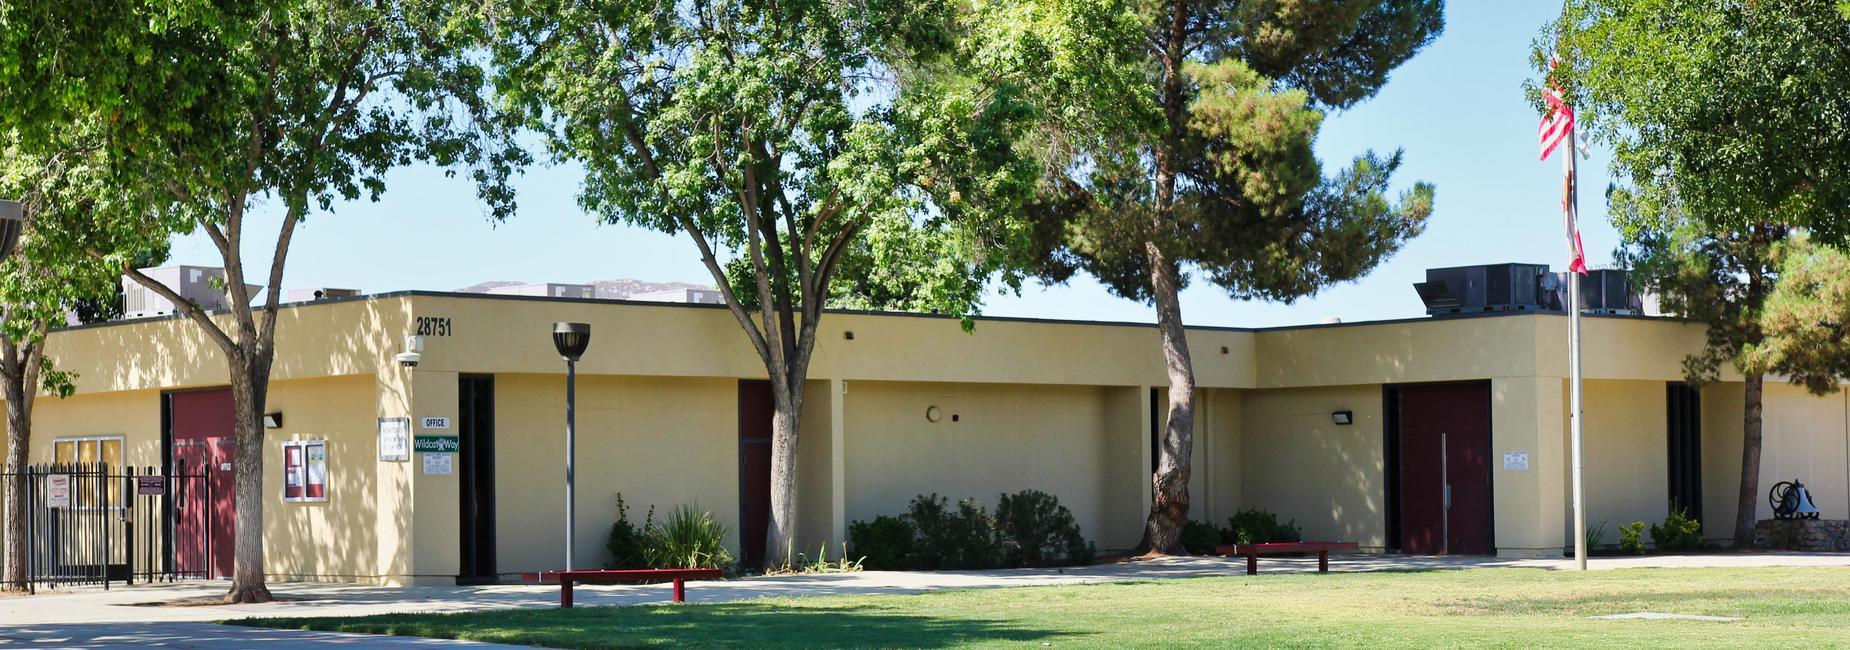 Winchester Elementary school entrance